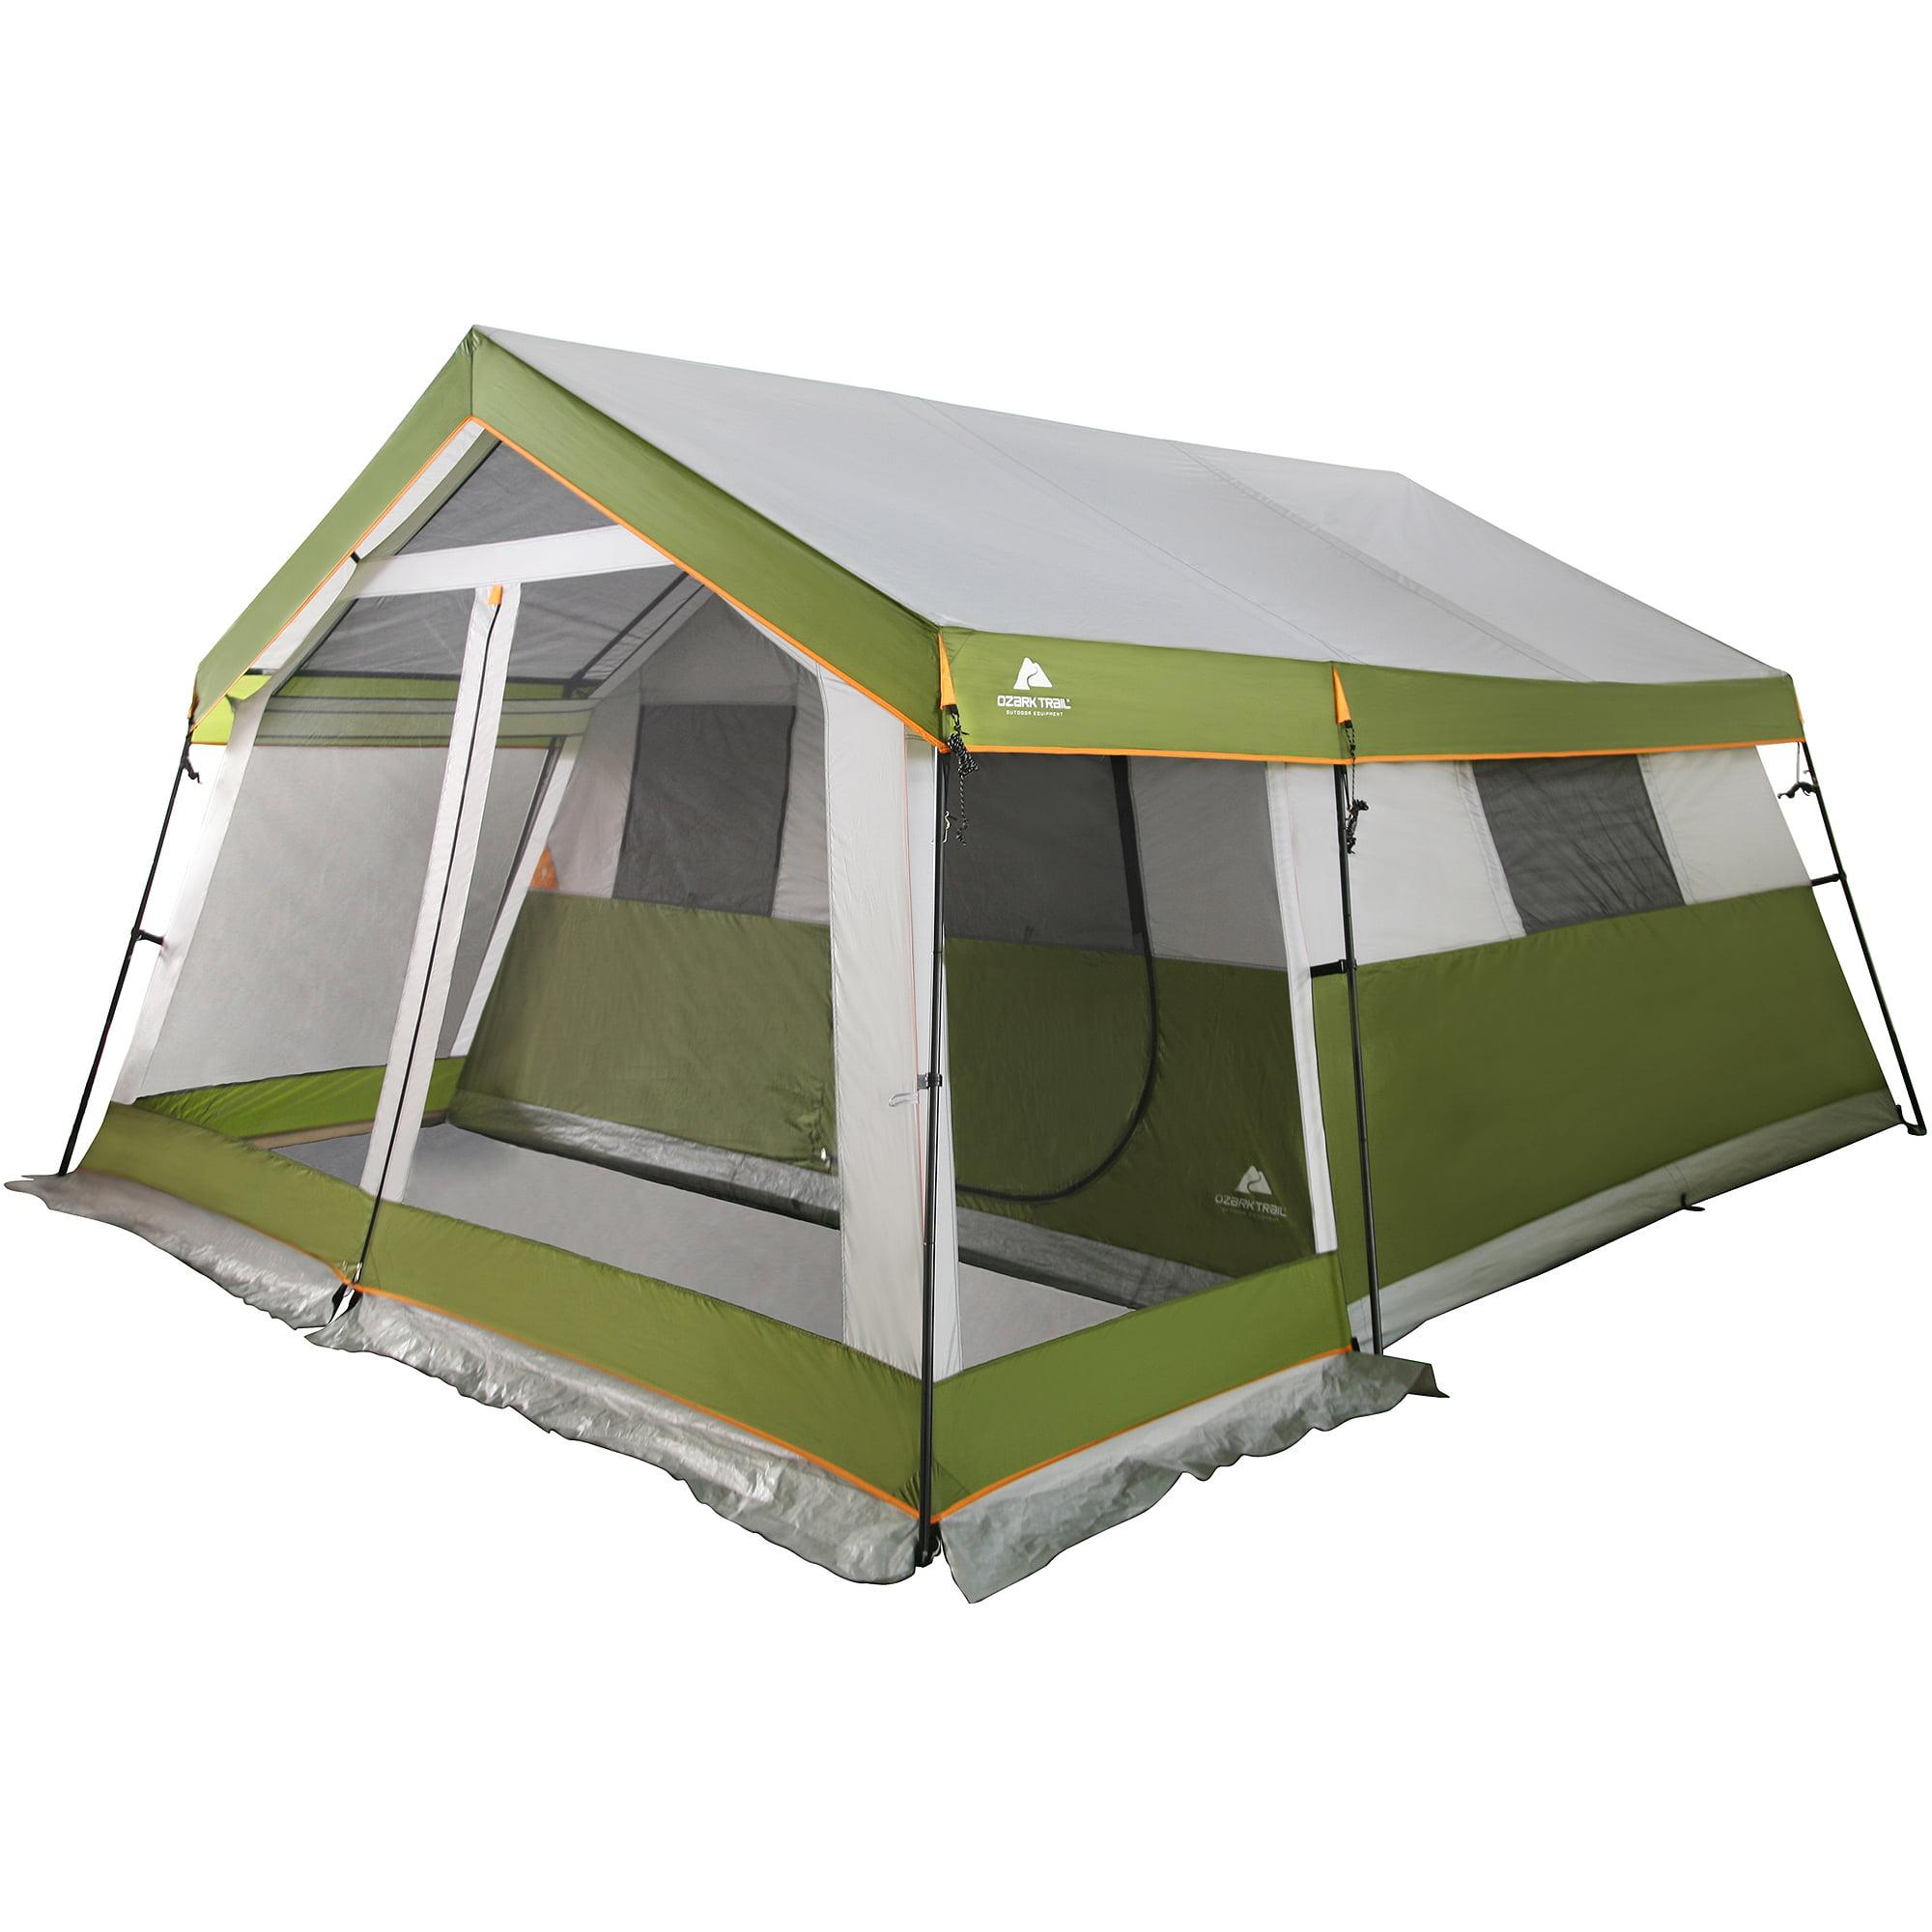 Ozark Trail 10-Person Family Cabin Tent with Screen Porch